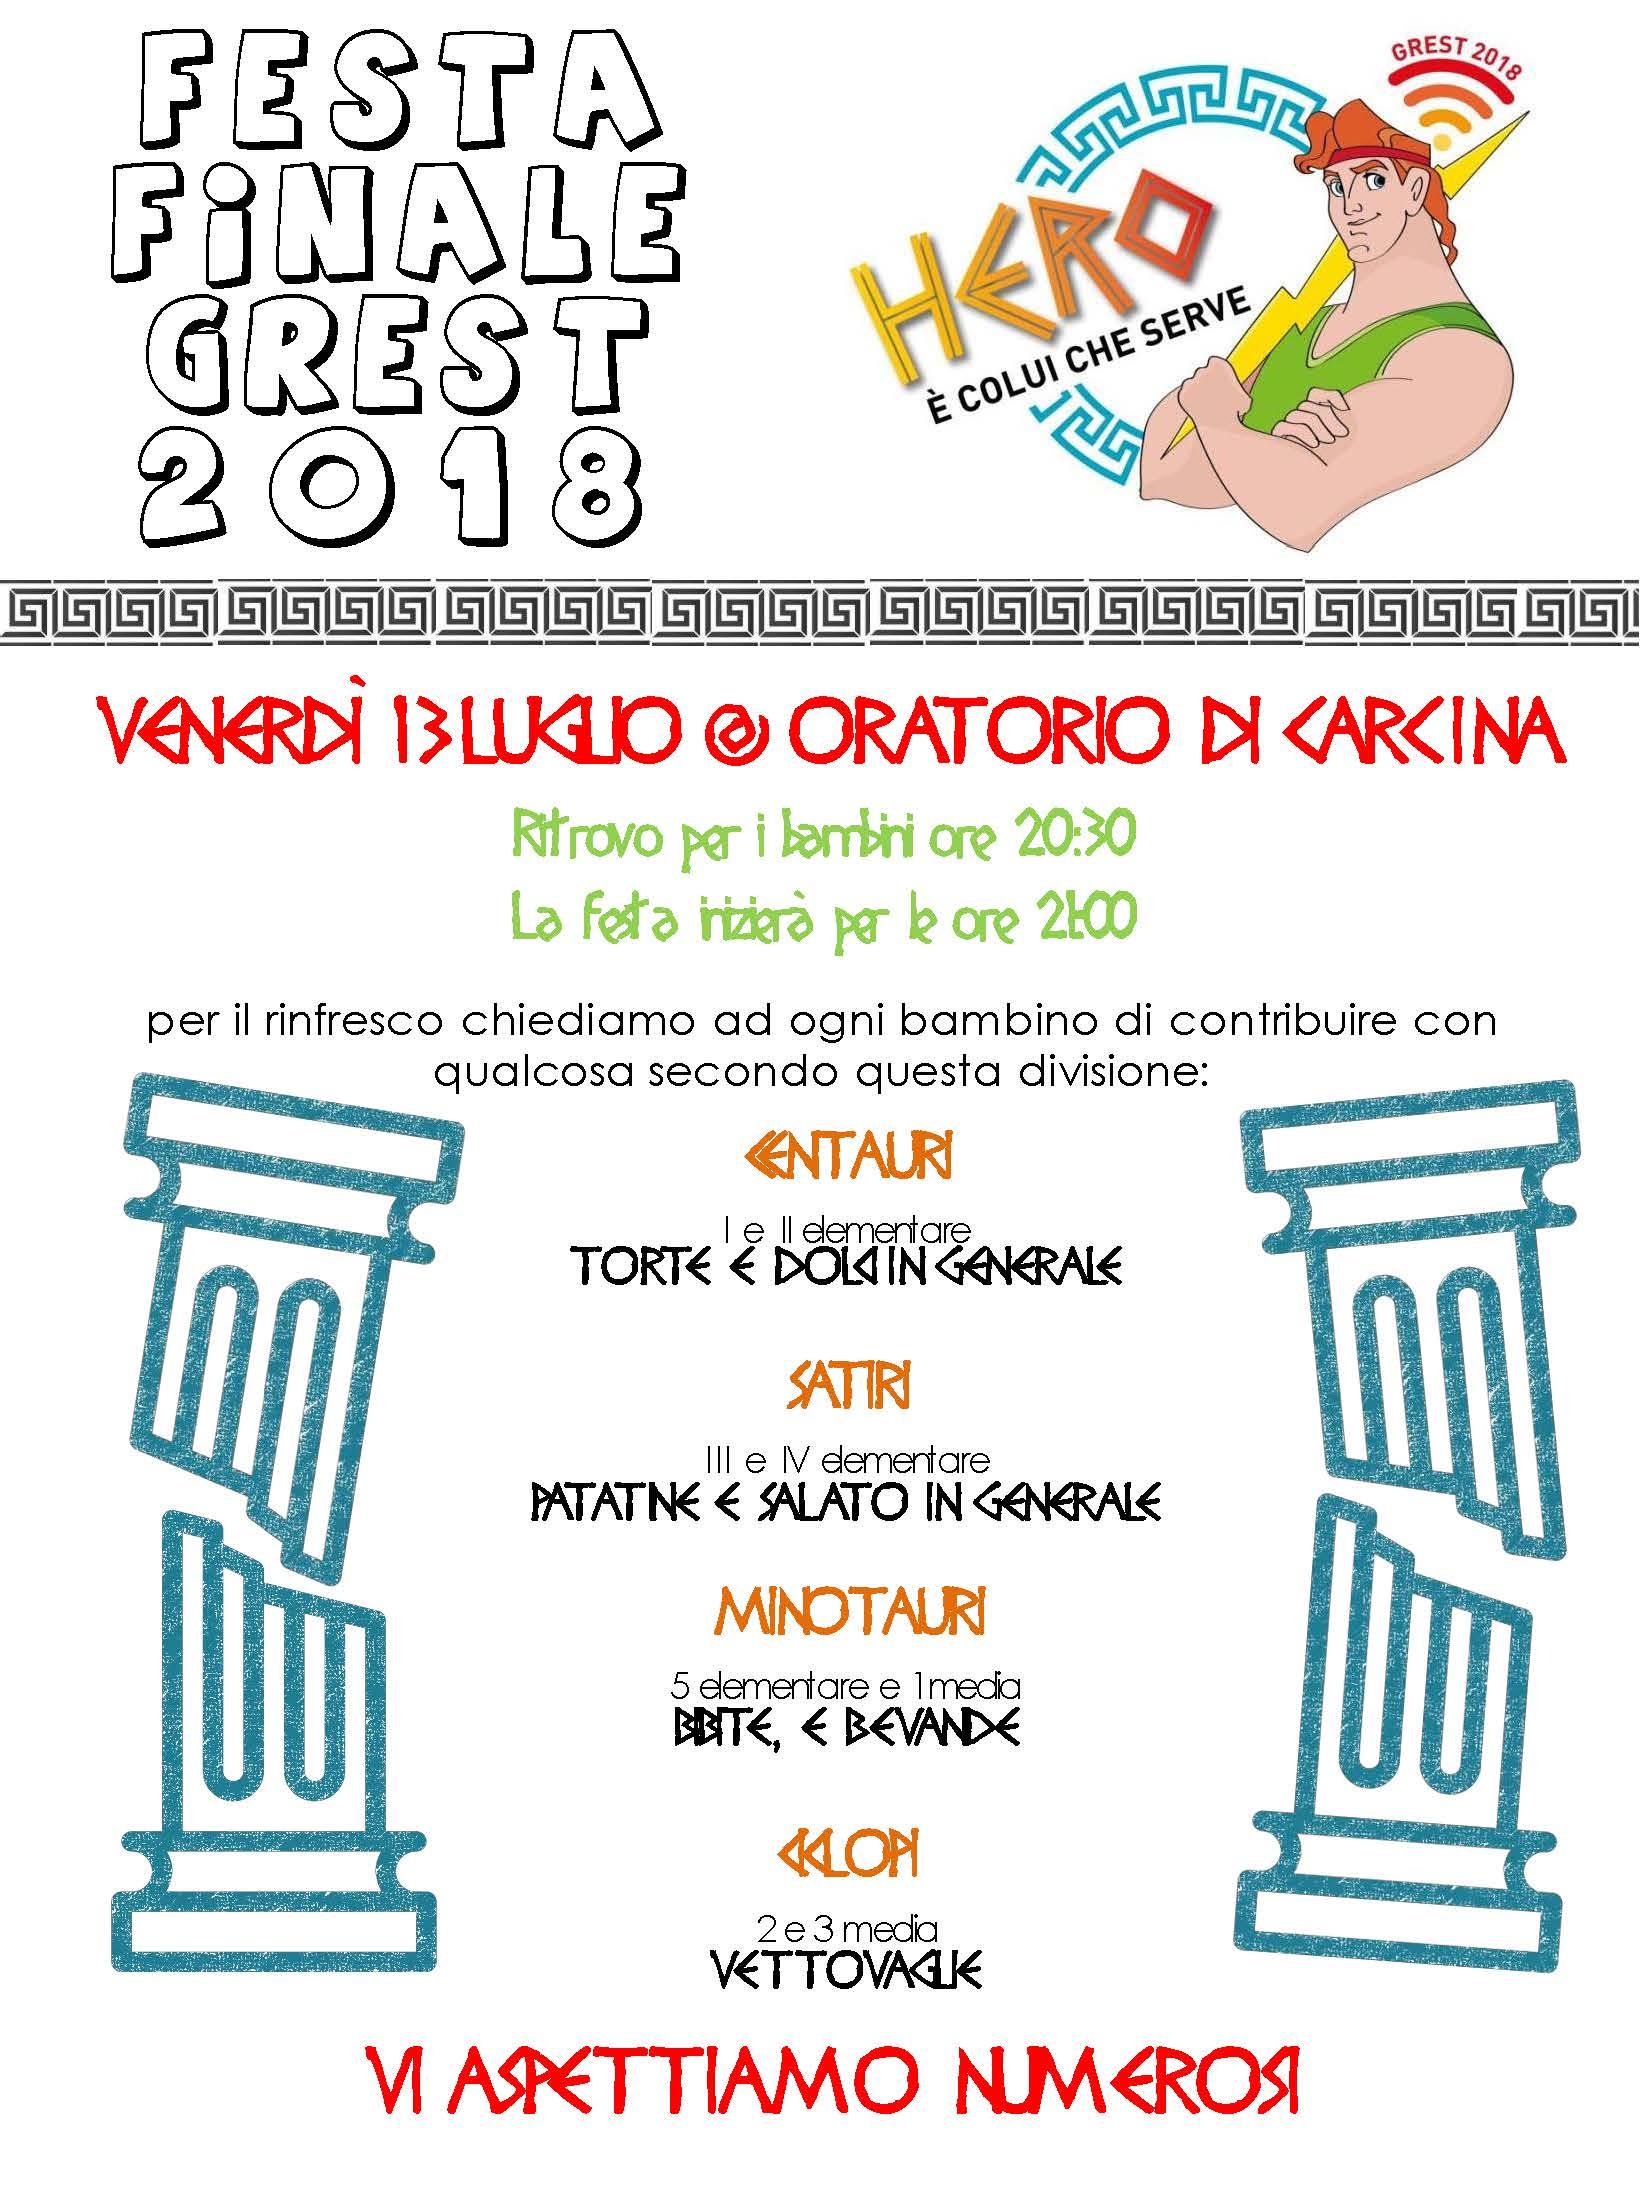 FESTA FINALE Grest Carcina 2018